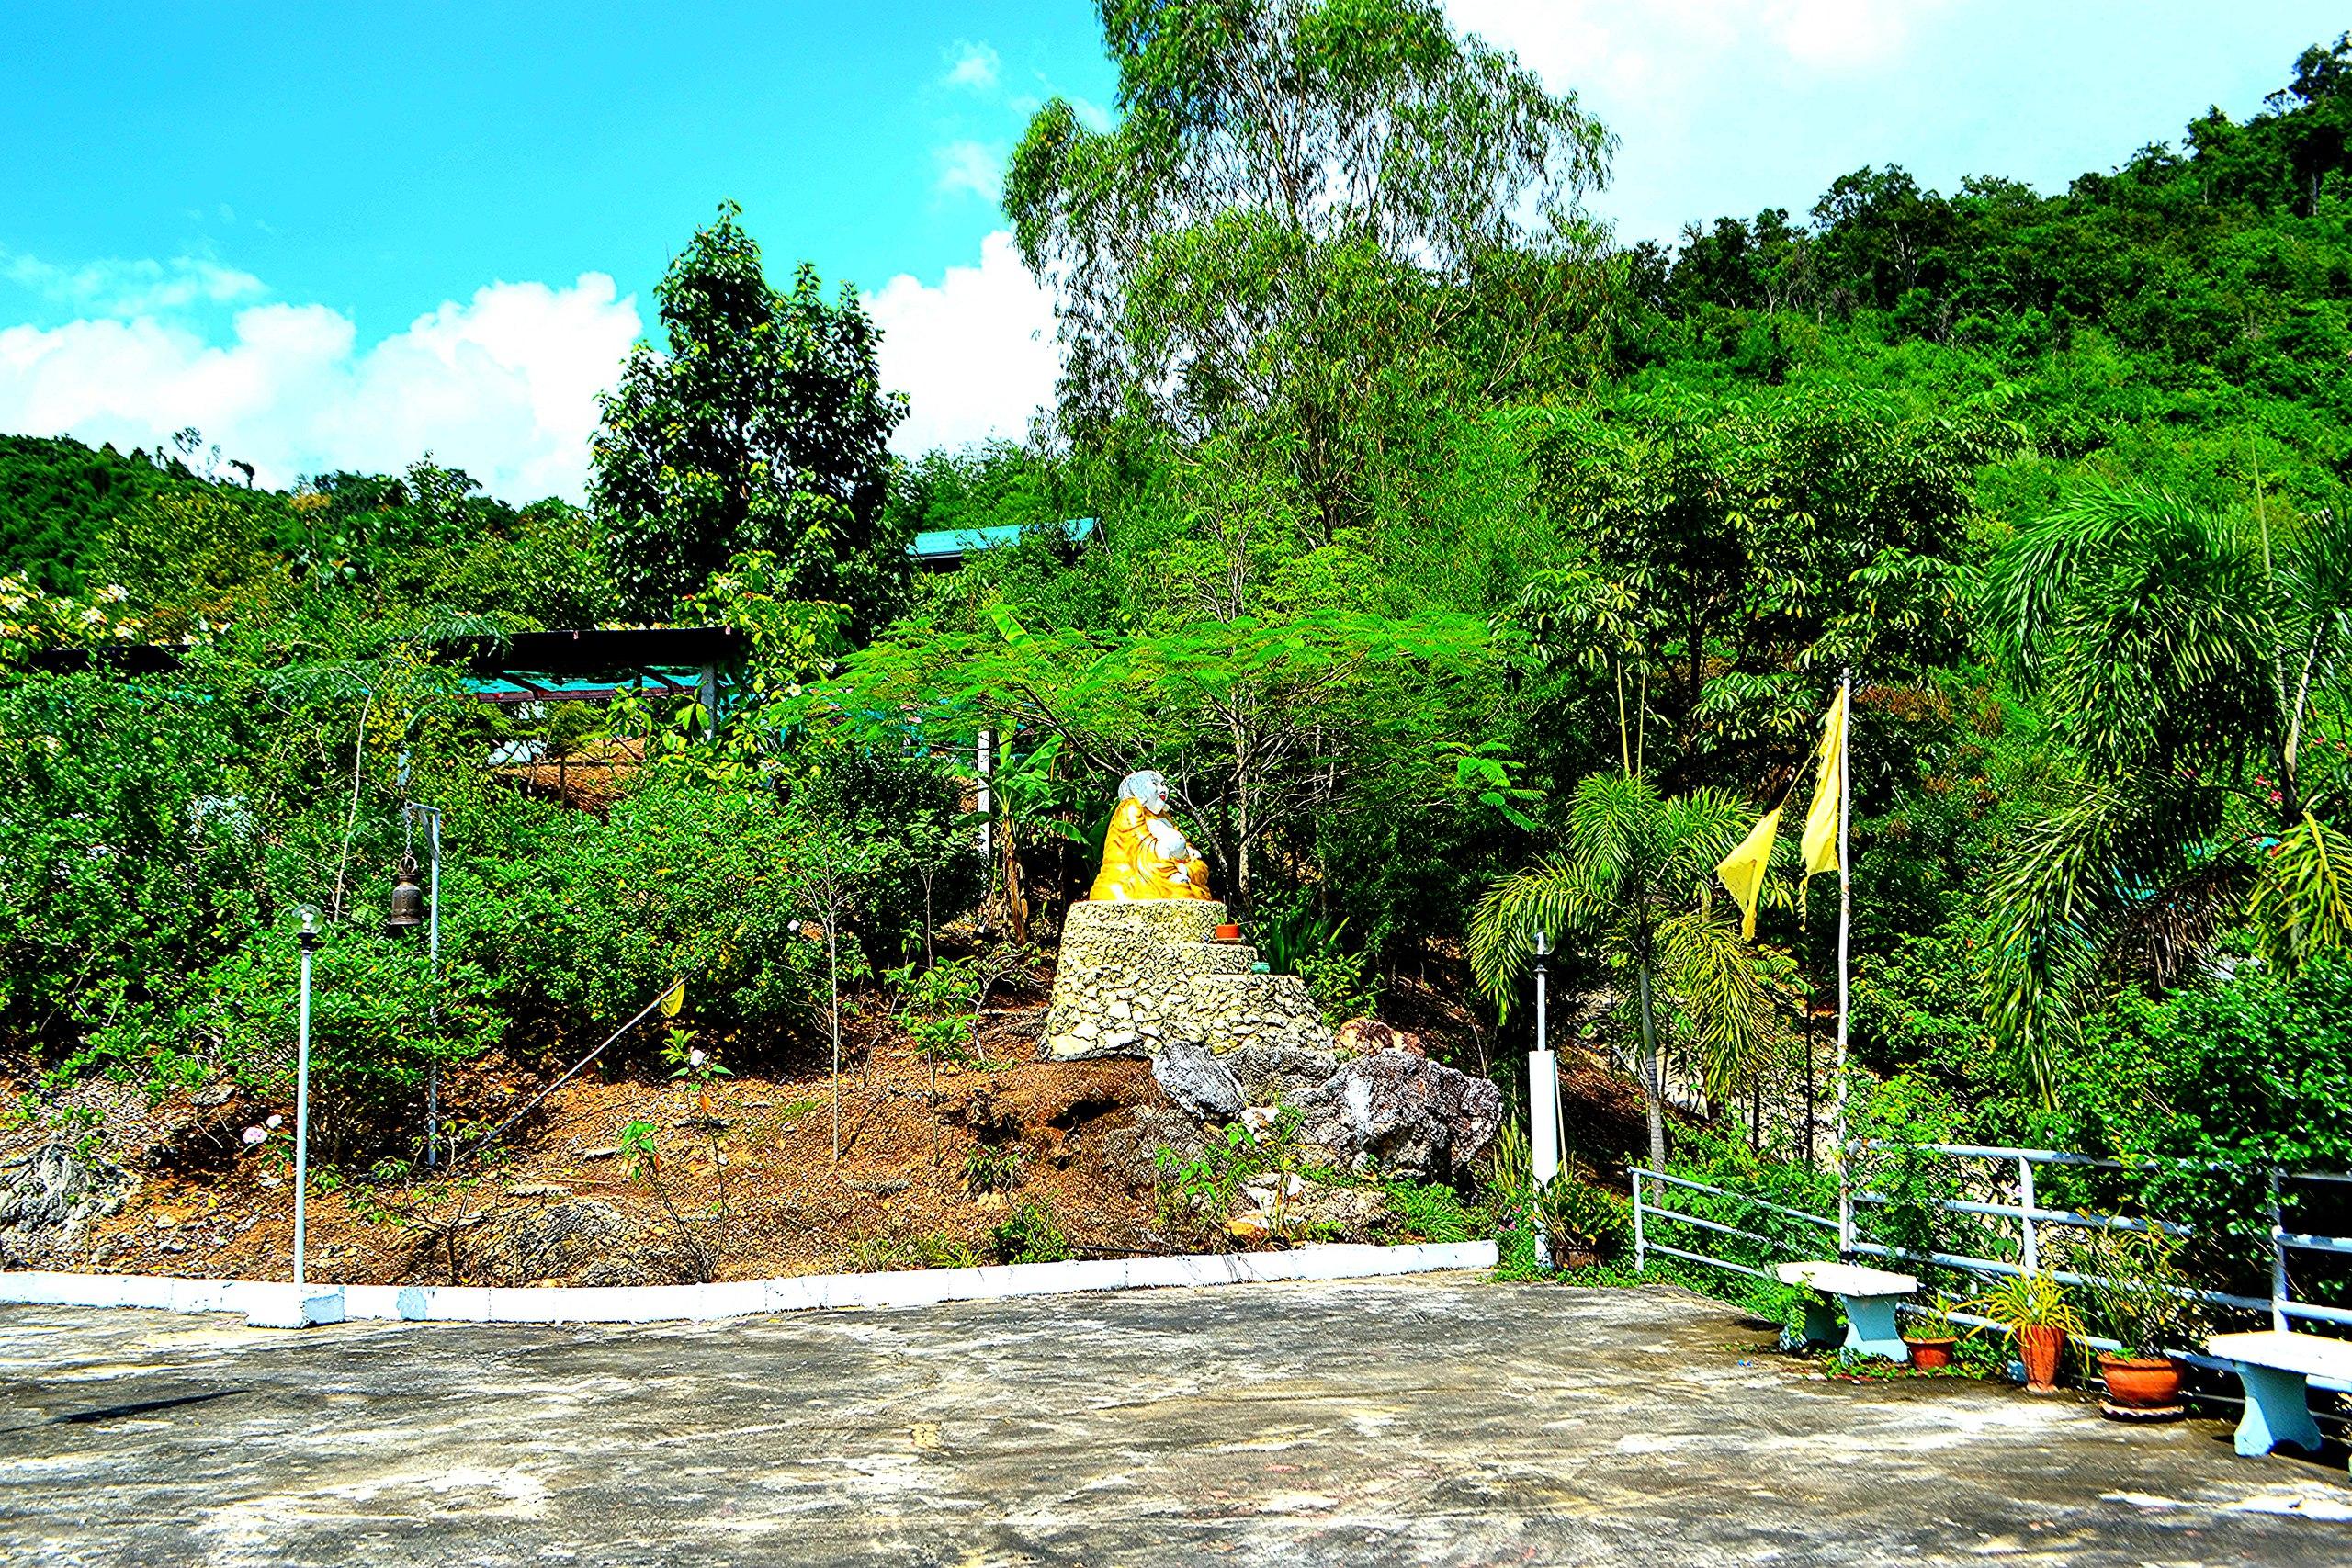 Елена Руденко (Валтея). Таиланд. Буддийский храм в горах. RsVruicd2_U